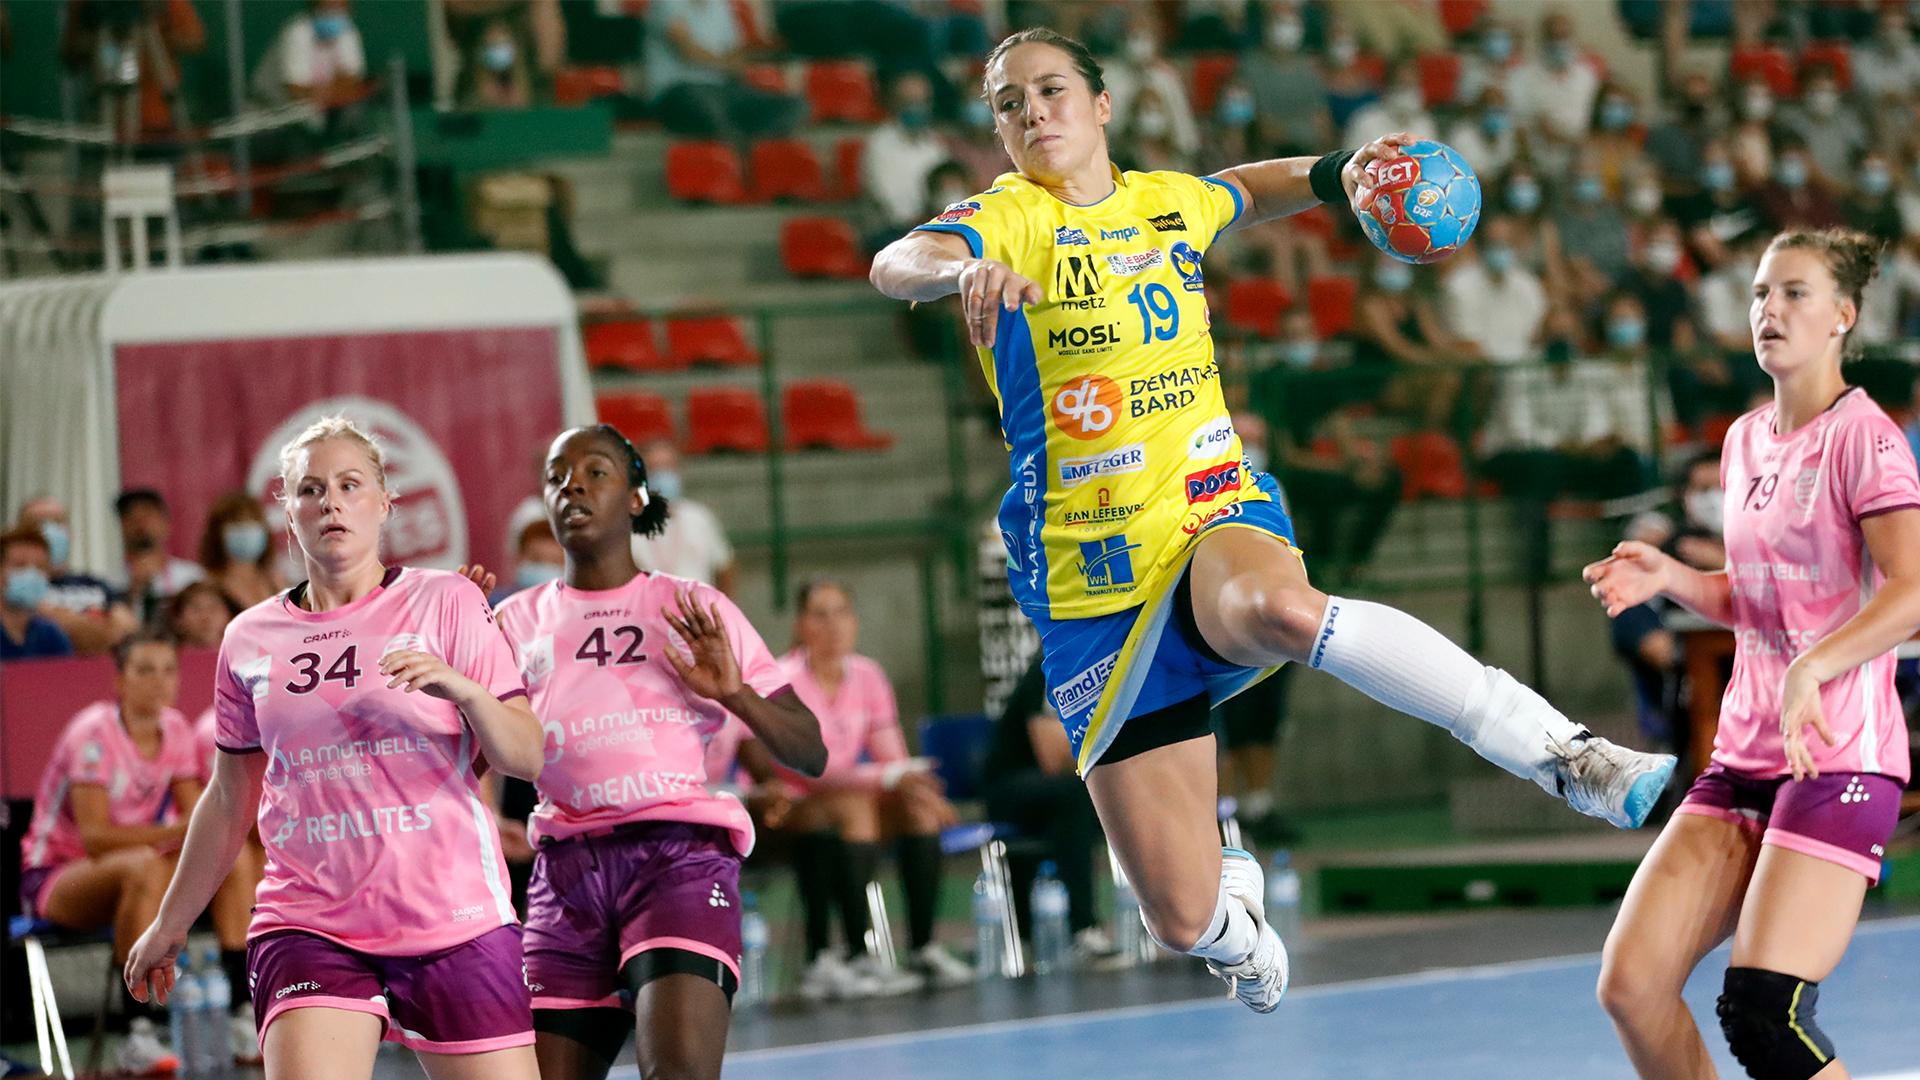 Burgaard Louise Metz Handball. Crédit photos : Sportissimo-Pillaud